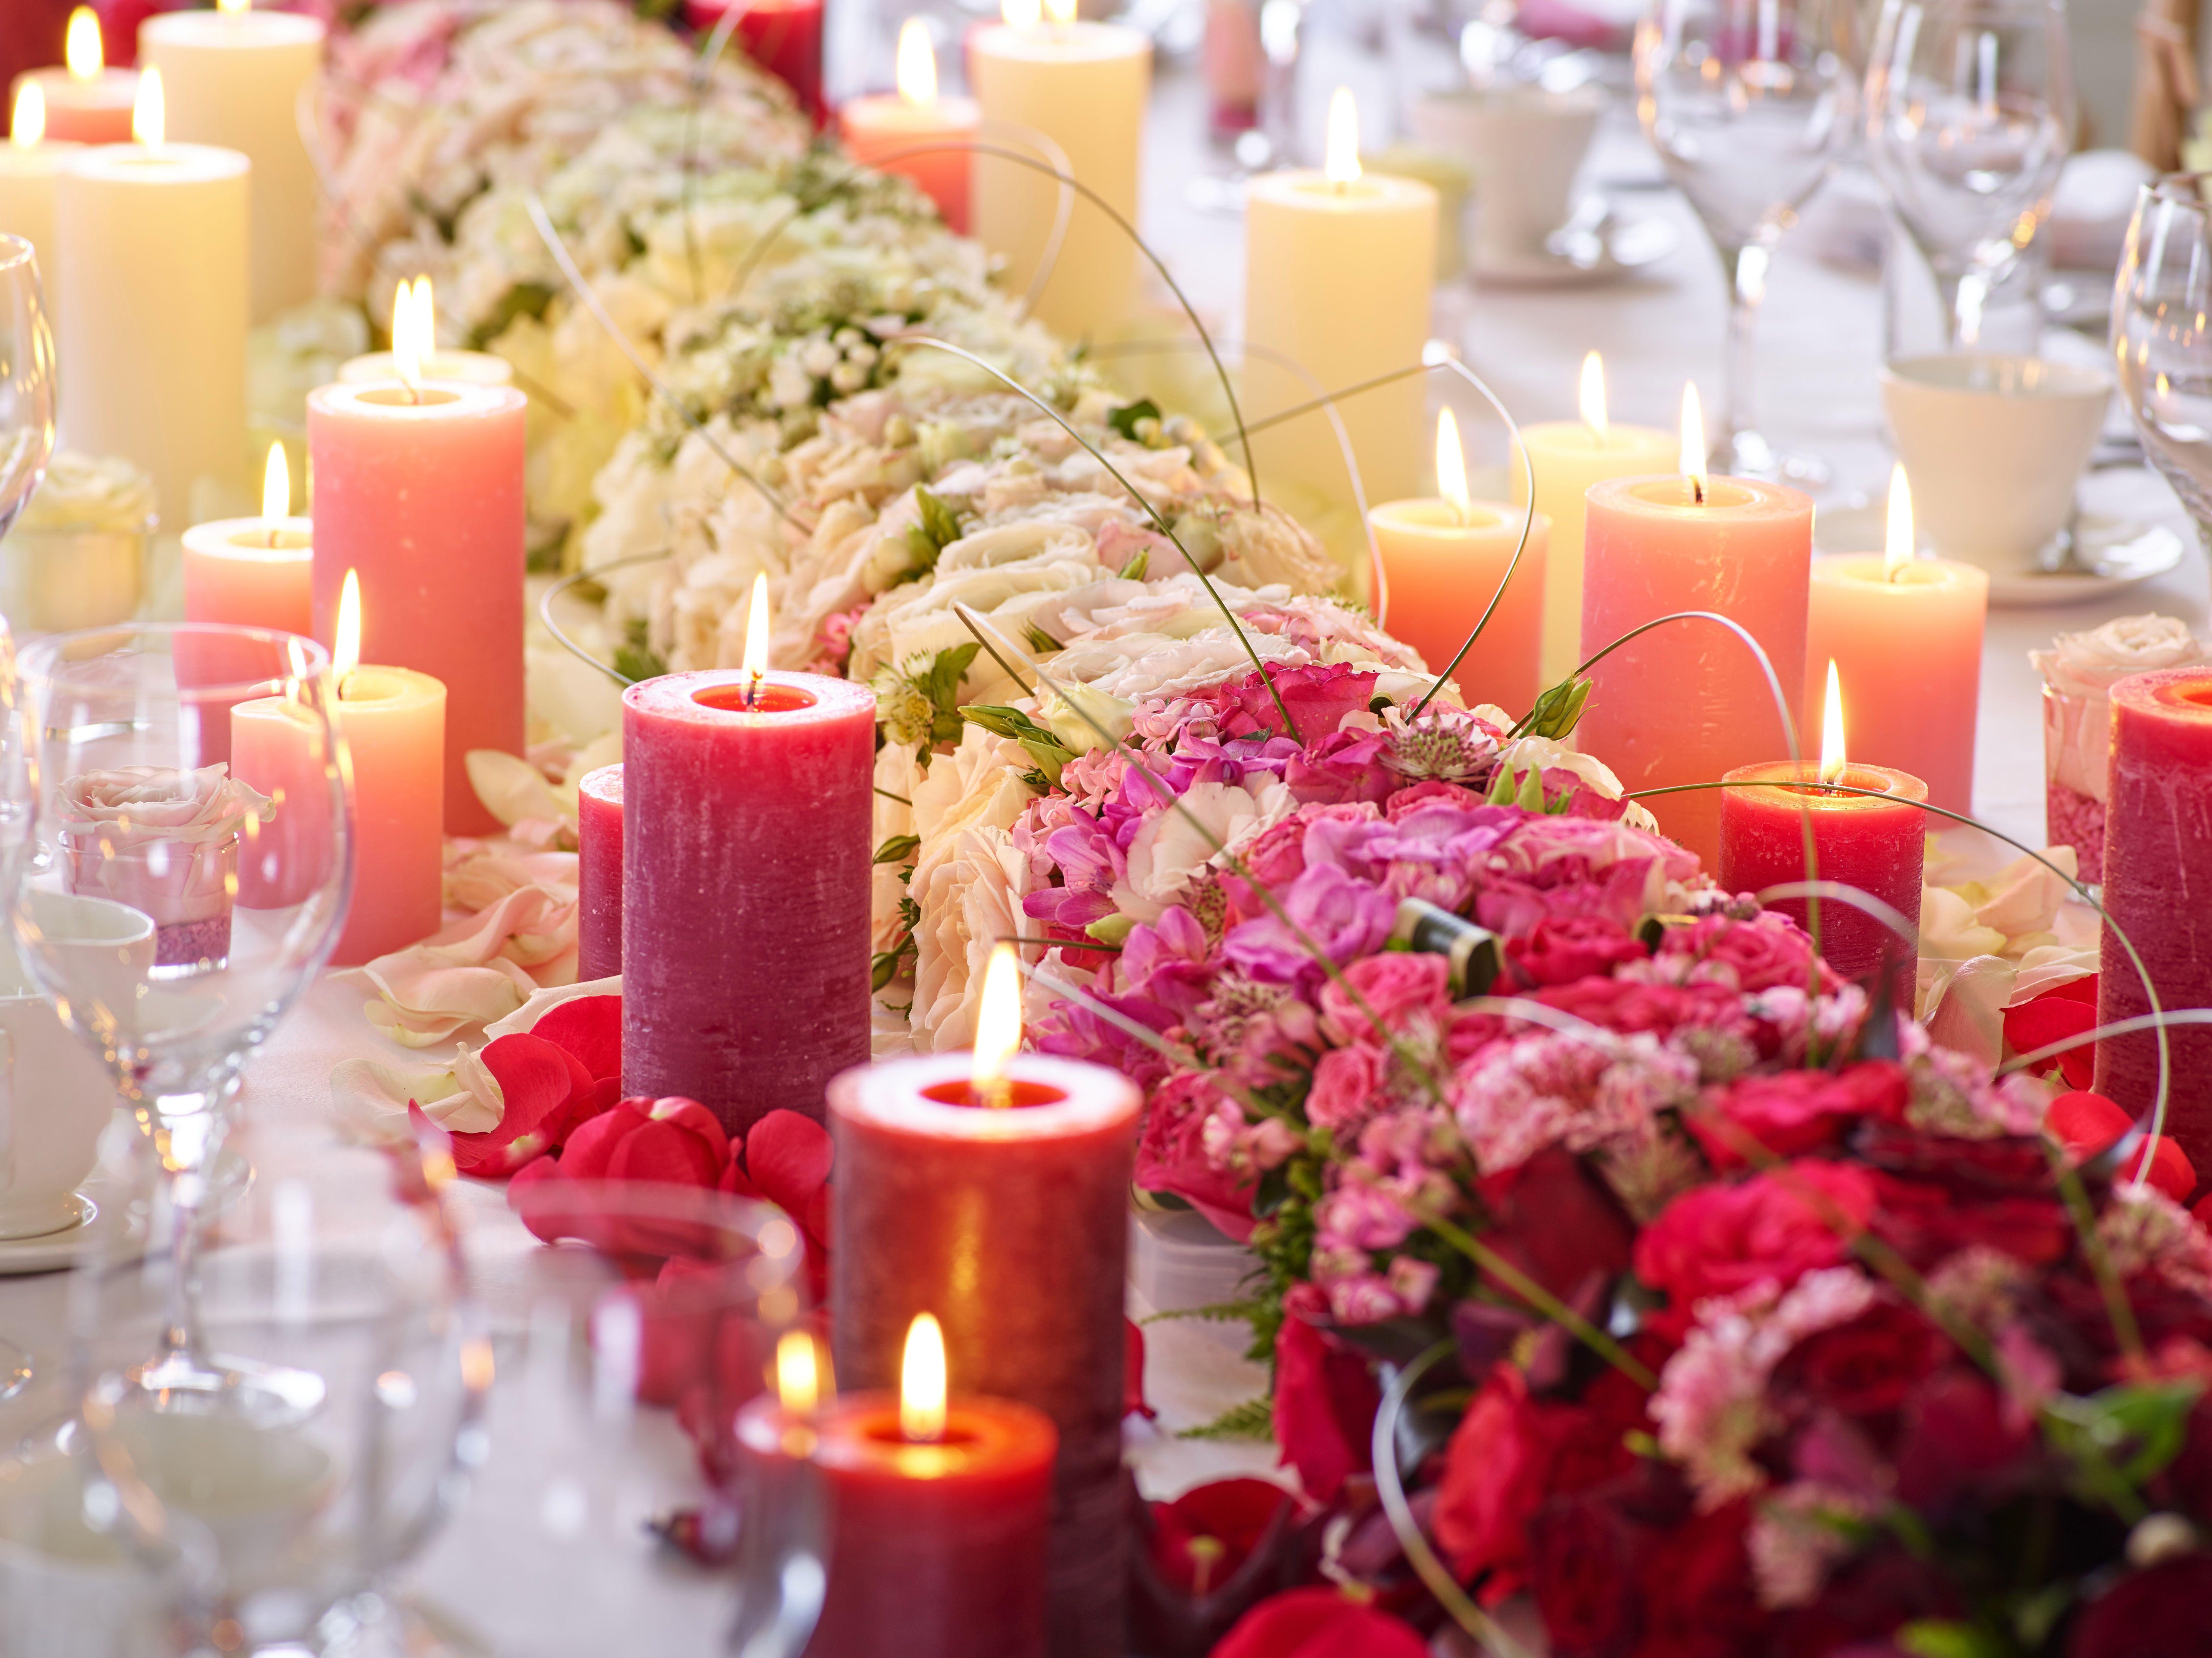 Stunning ombré table arrangement complete with candles ombré